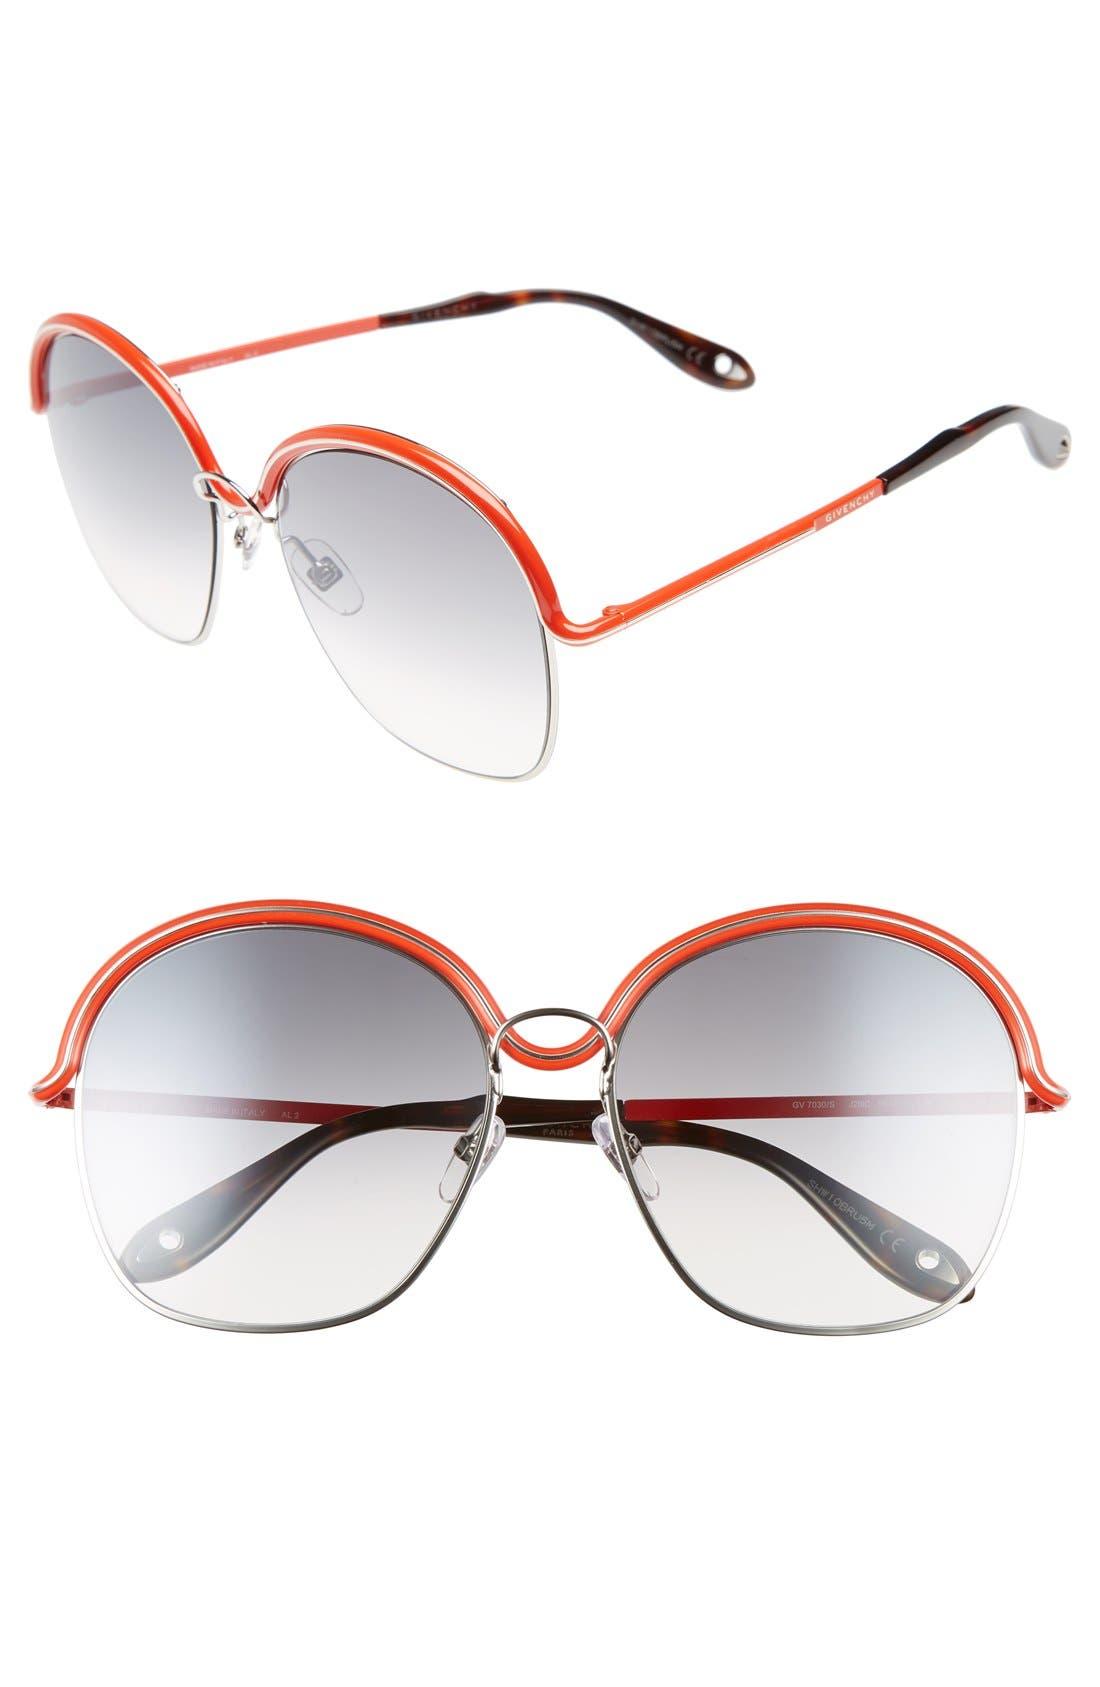 7030/S 58mm Oversized Sunglasses,                             Alternate thumbnail 4, color,                             040